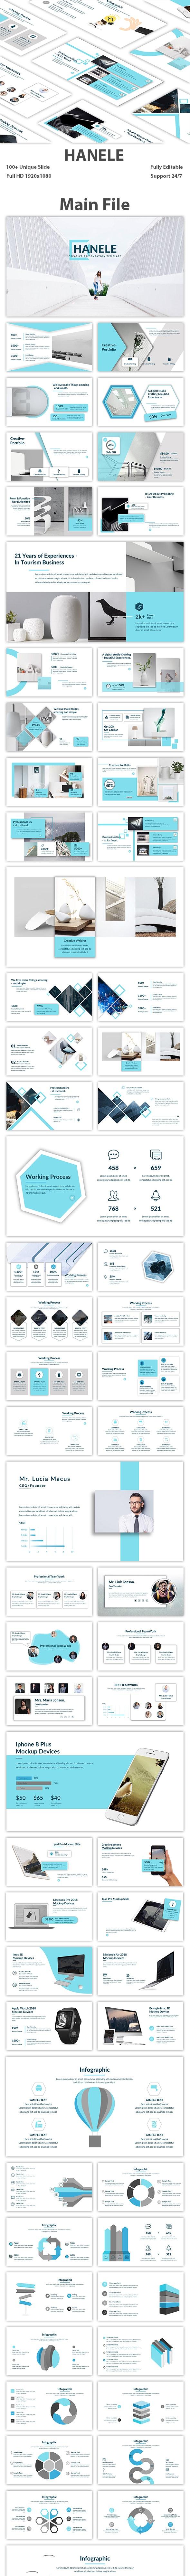 Hanele Creative PowePoint Template - Creative Keynote Templates